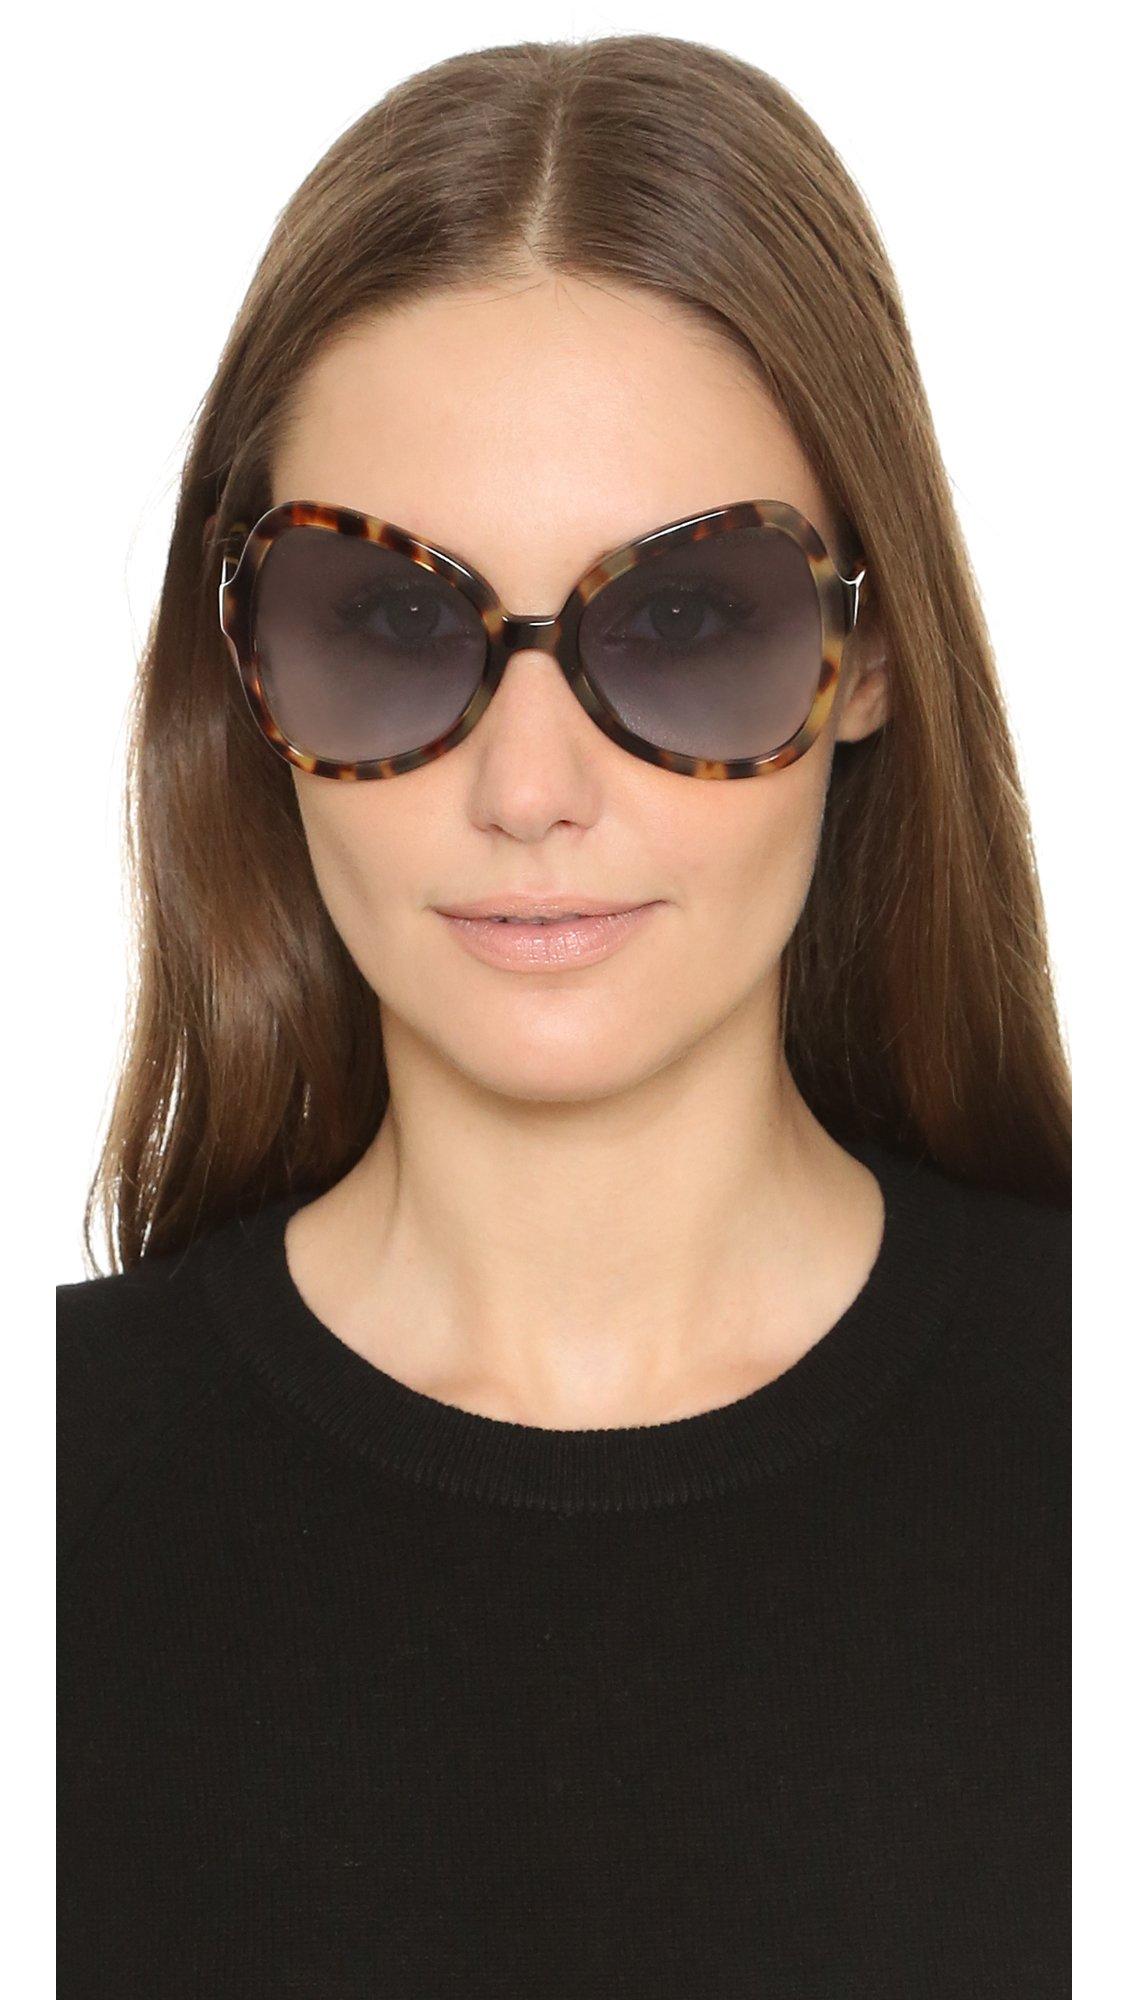 prada purse pictures - Prada Butterfly Sunglasses in Blue (Medium Havana/Blue)   Lyst